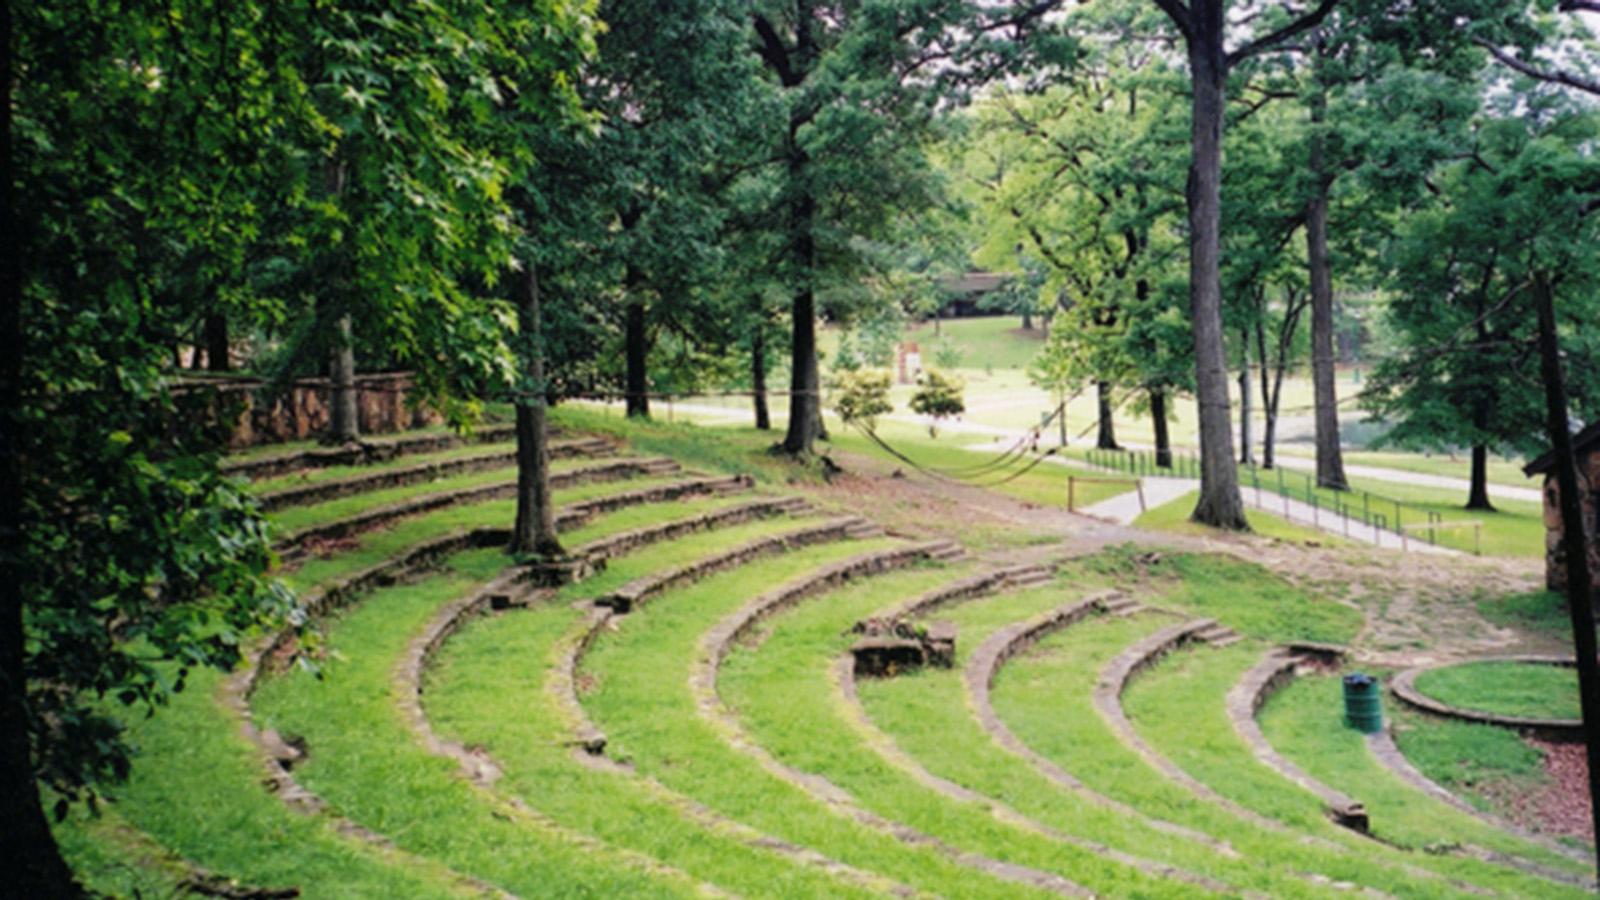 AL_Birmingham_AvondaleParkGardenTheater_05_CharlesBirnbaum_2003_Signature.jpg